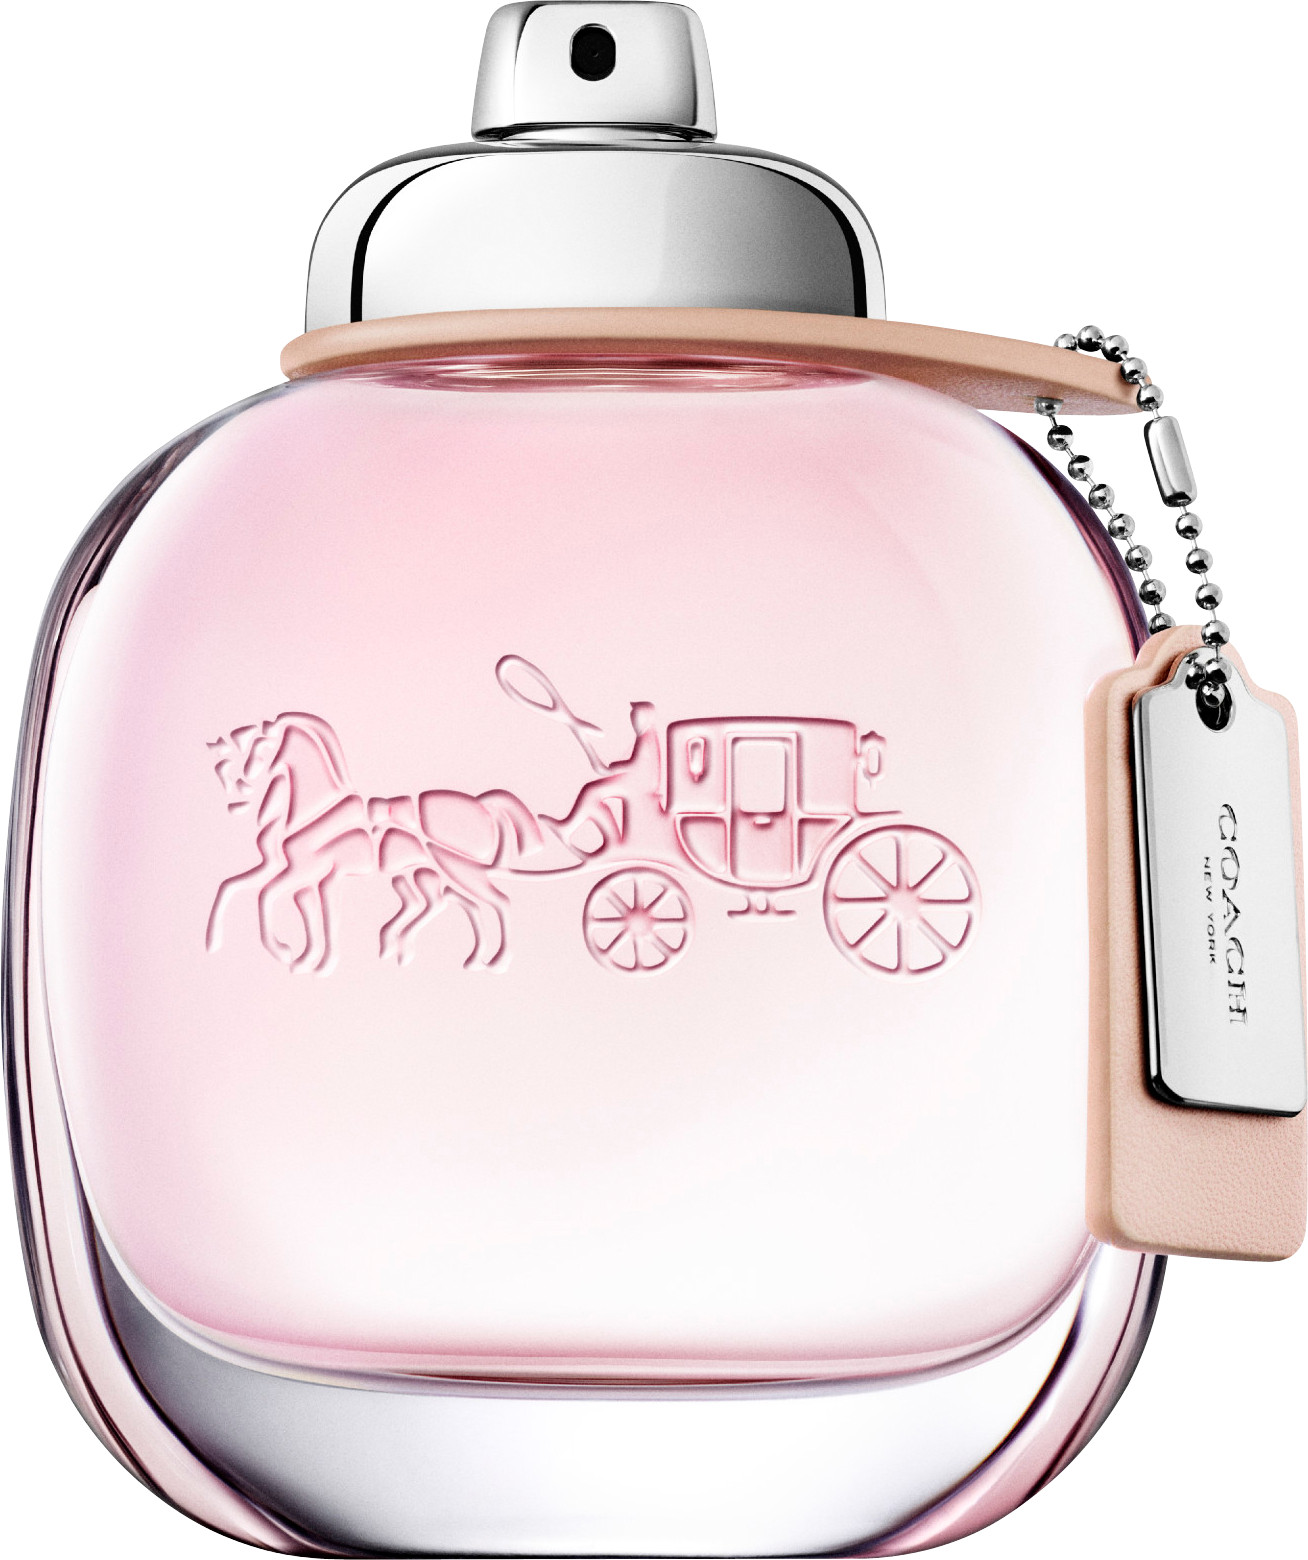 Coach The Fragrance Eau de Toilette for women ขนาด 90ml. กล่องเทสเตอร์